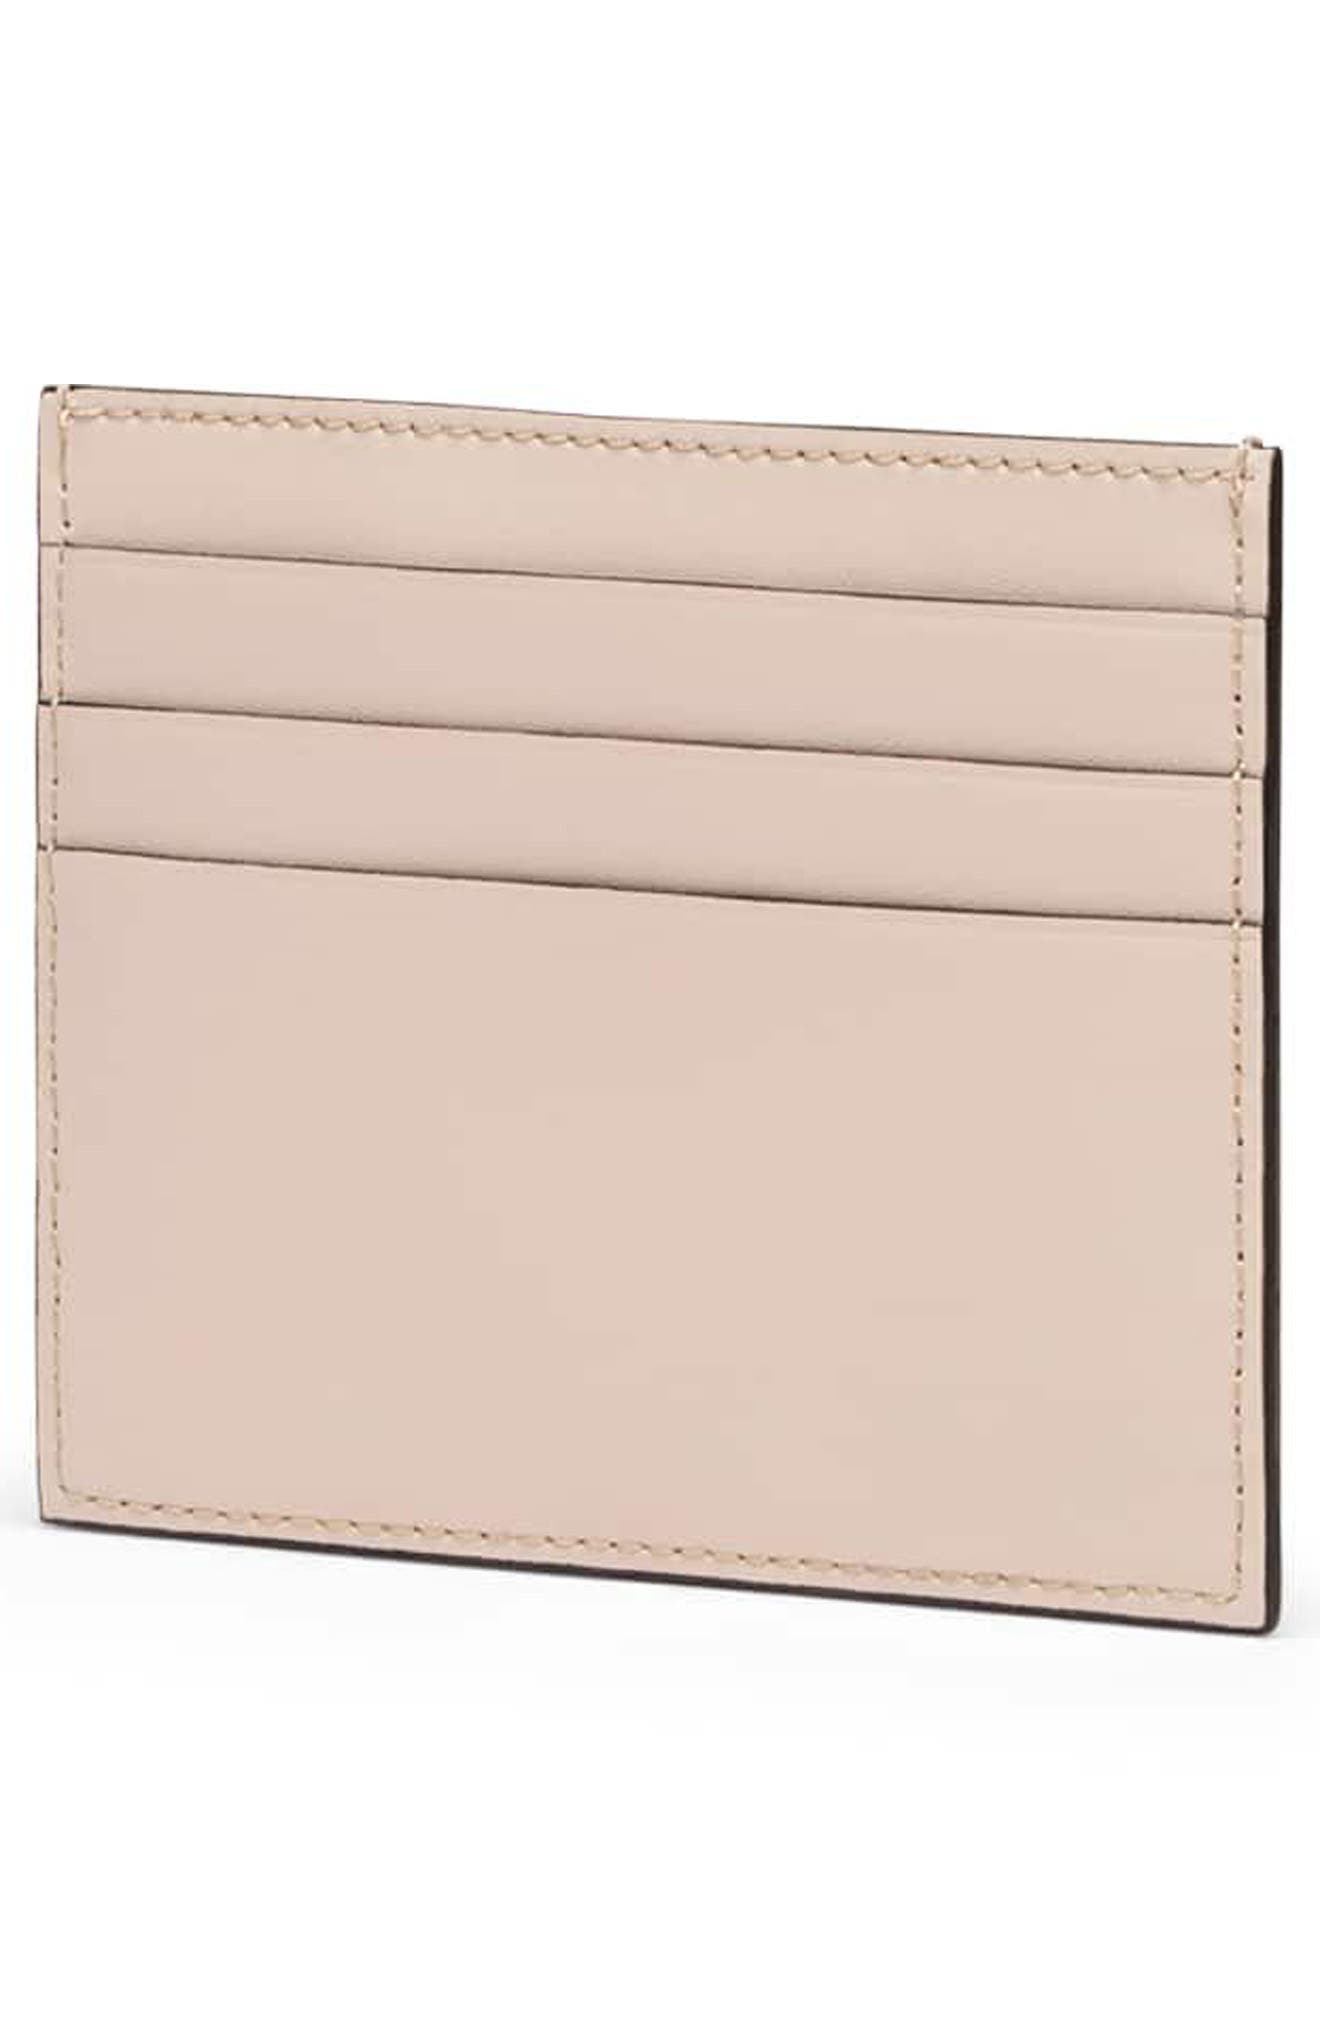 Logo Leather Card Case,                             Alternate thumbnail 3, color,                             SOAP/ ORO SOFT